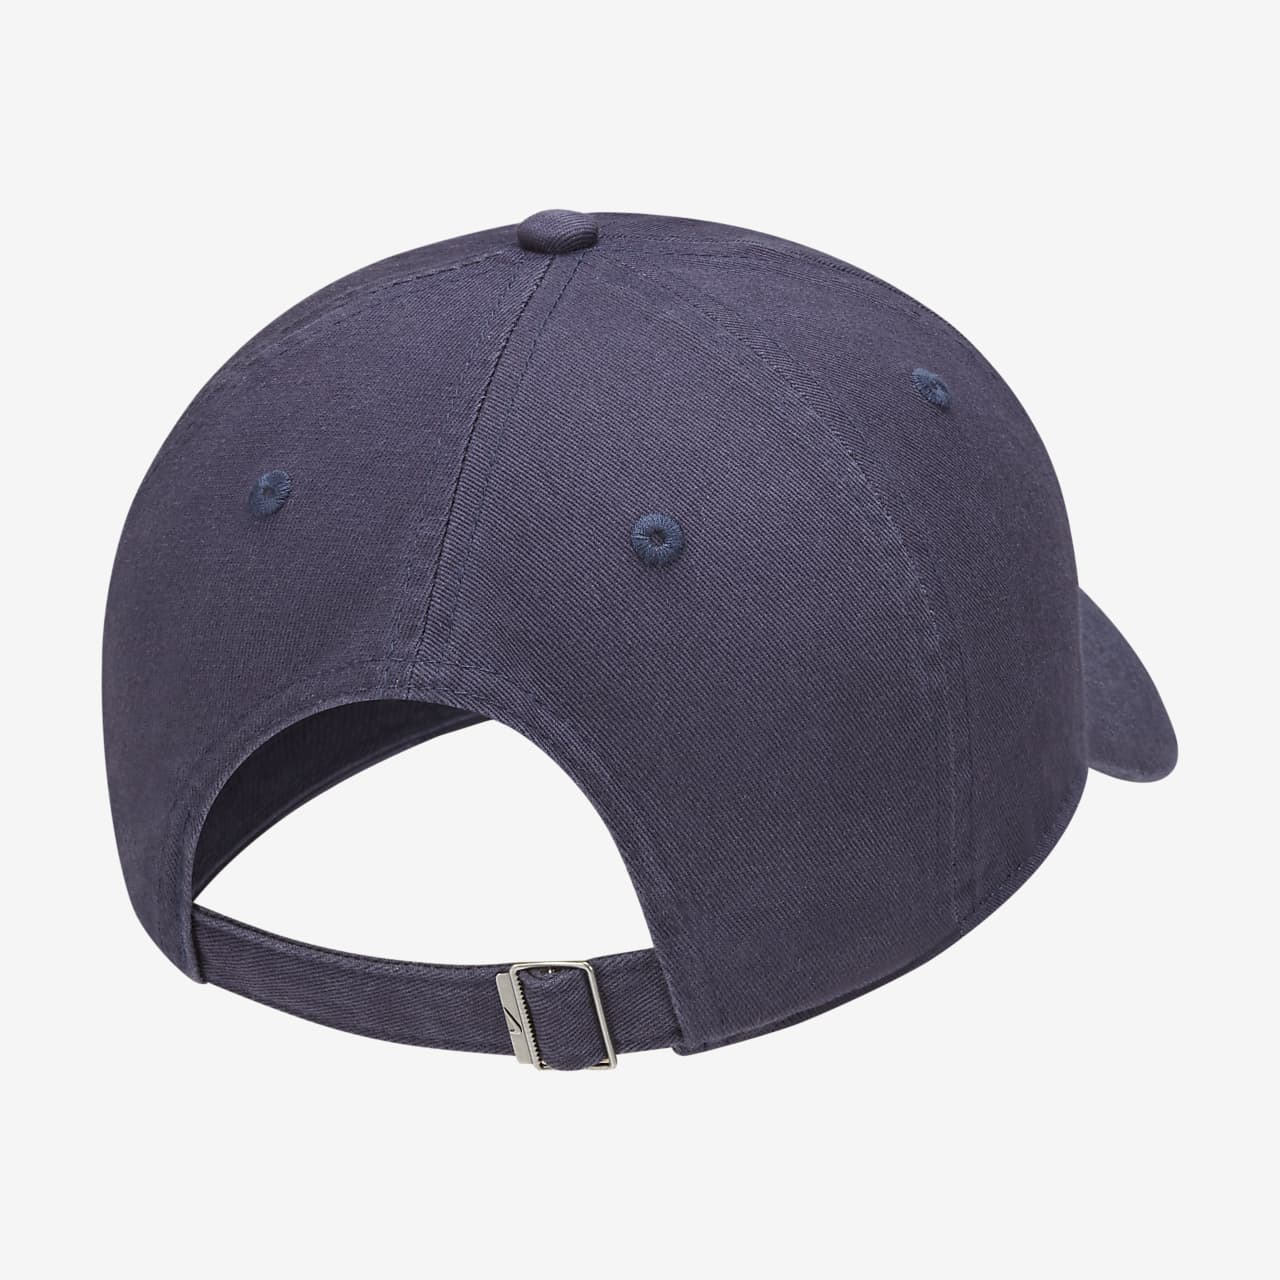 be987af843149 Nike Sportswear Heritage86 Futura Washed Gorra. Nike.com ES